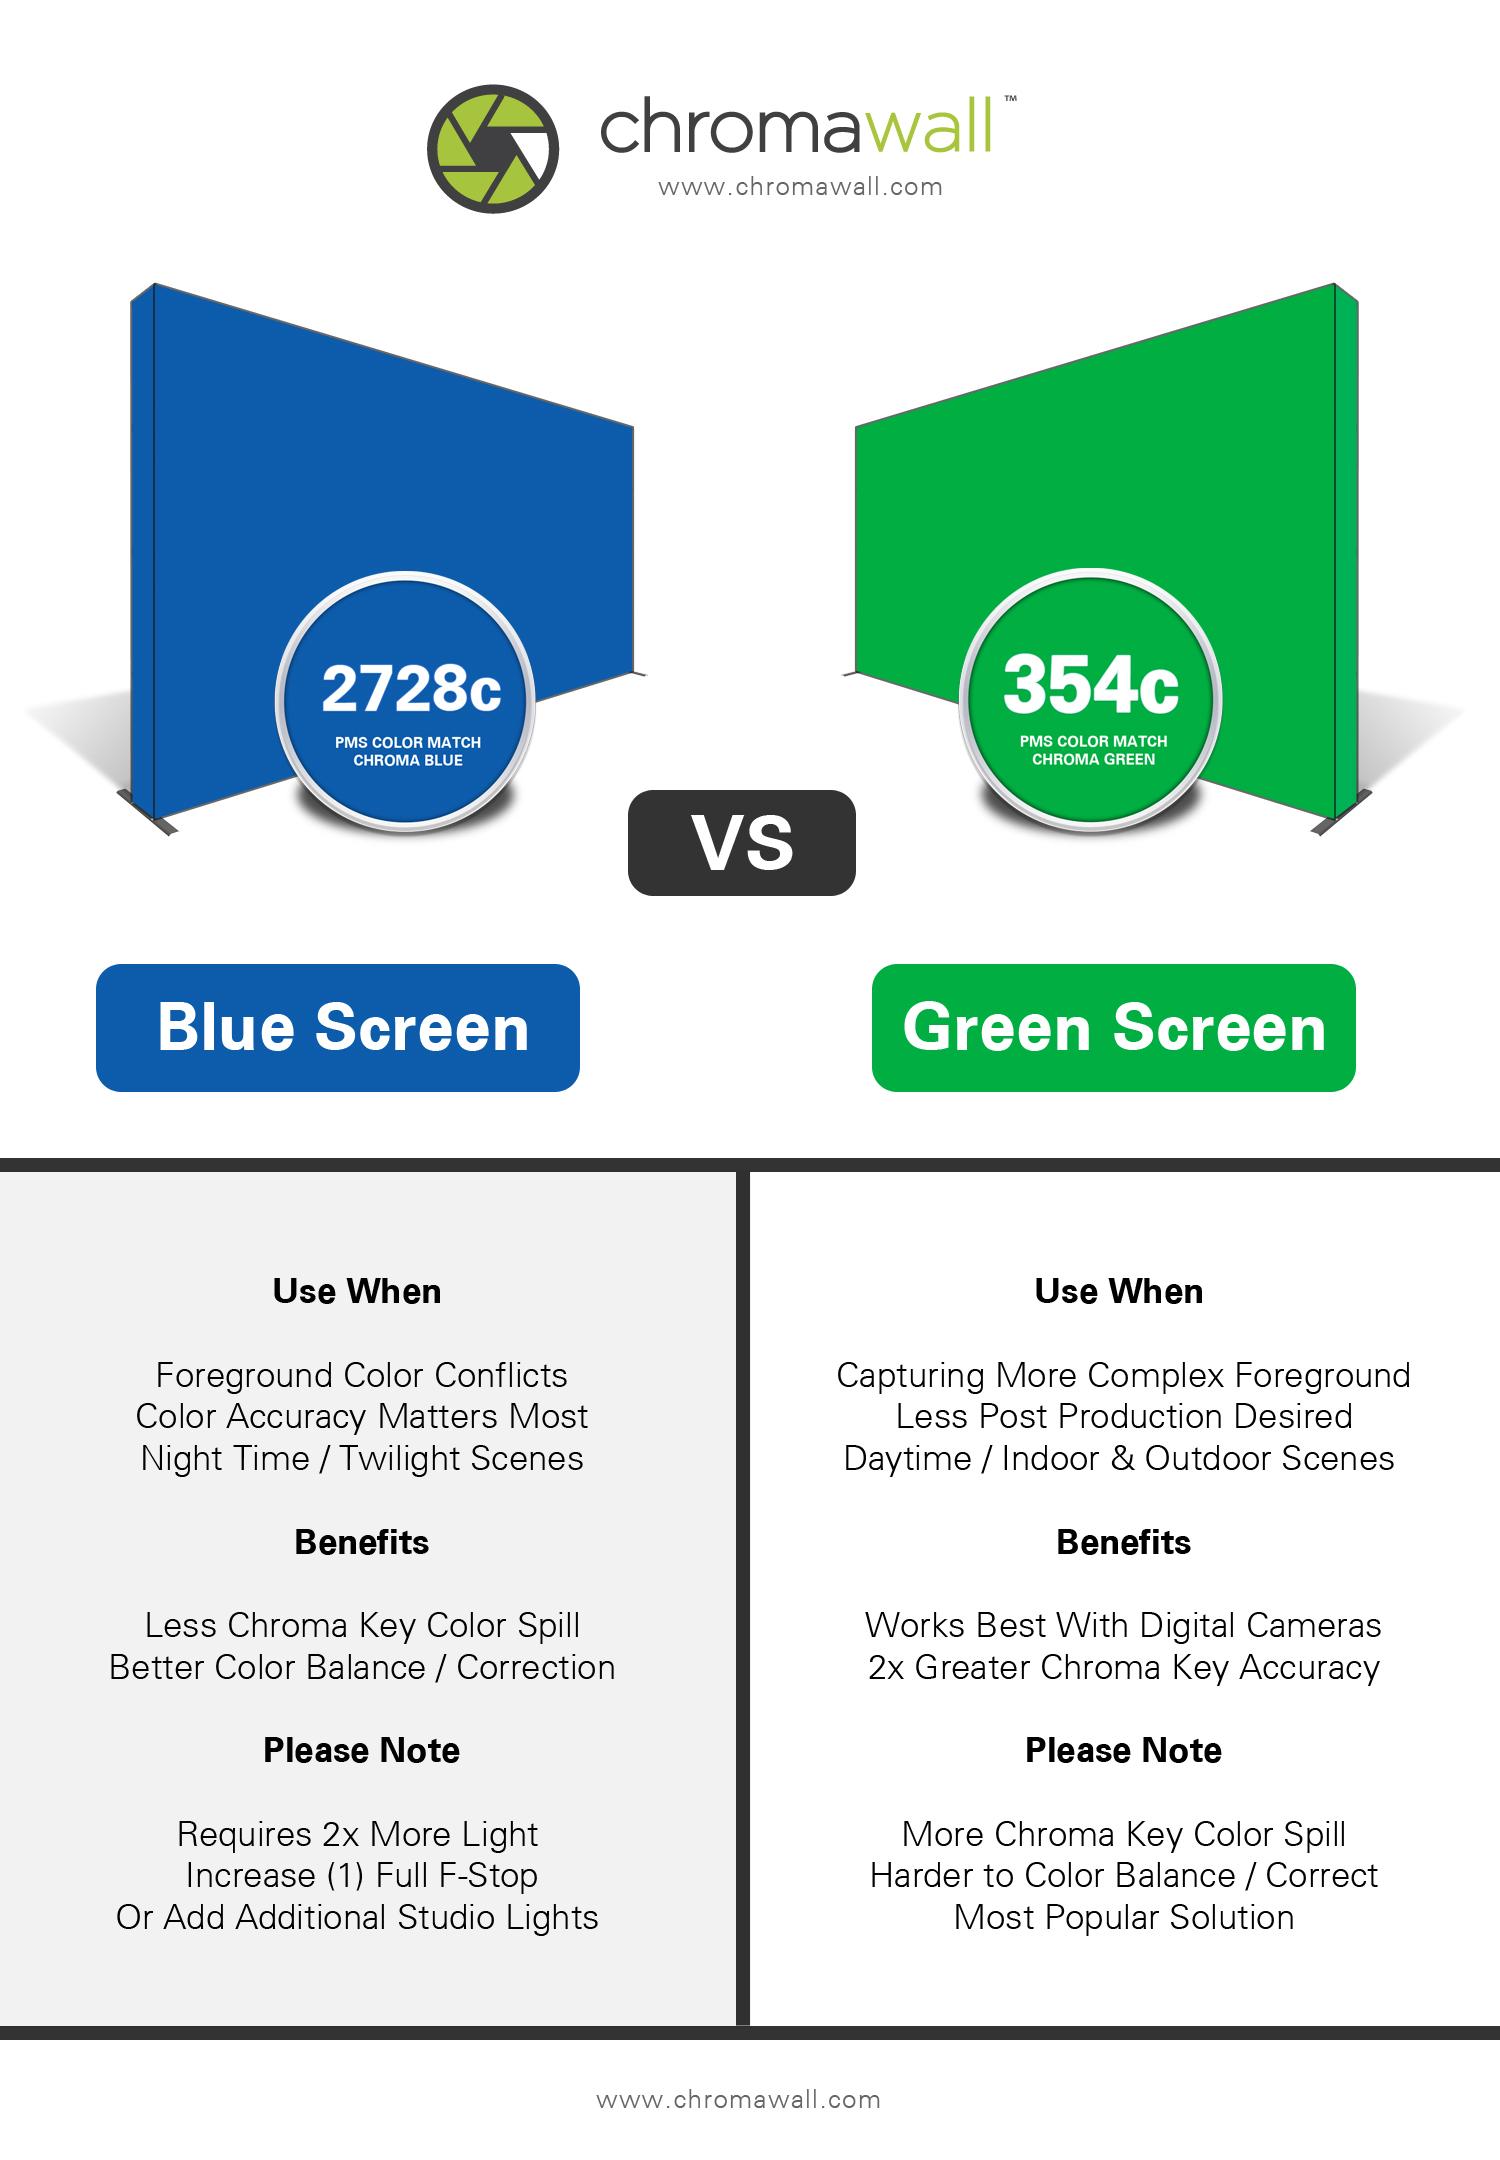 green screen vs. blue screen